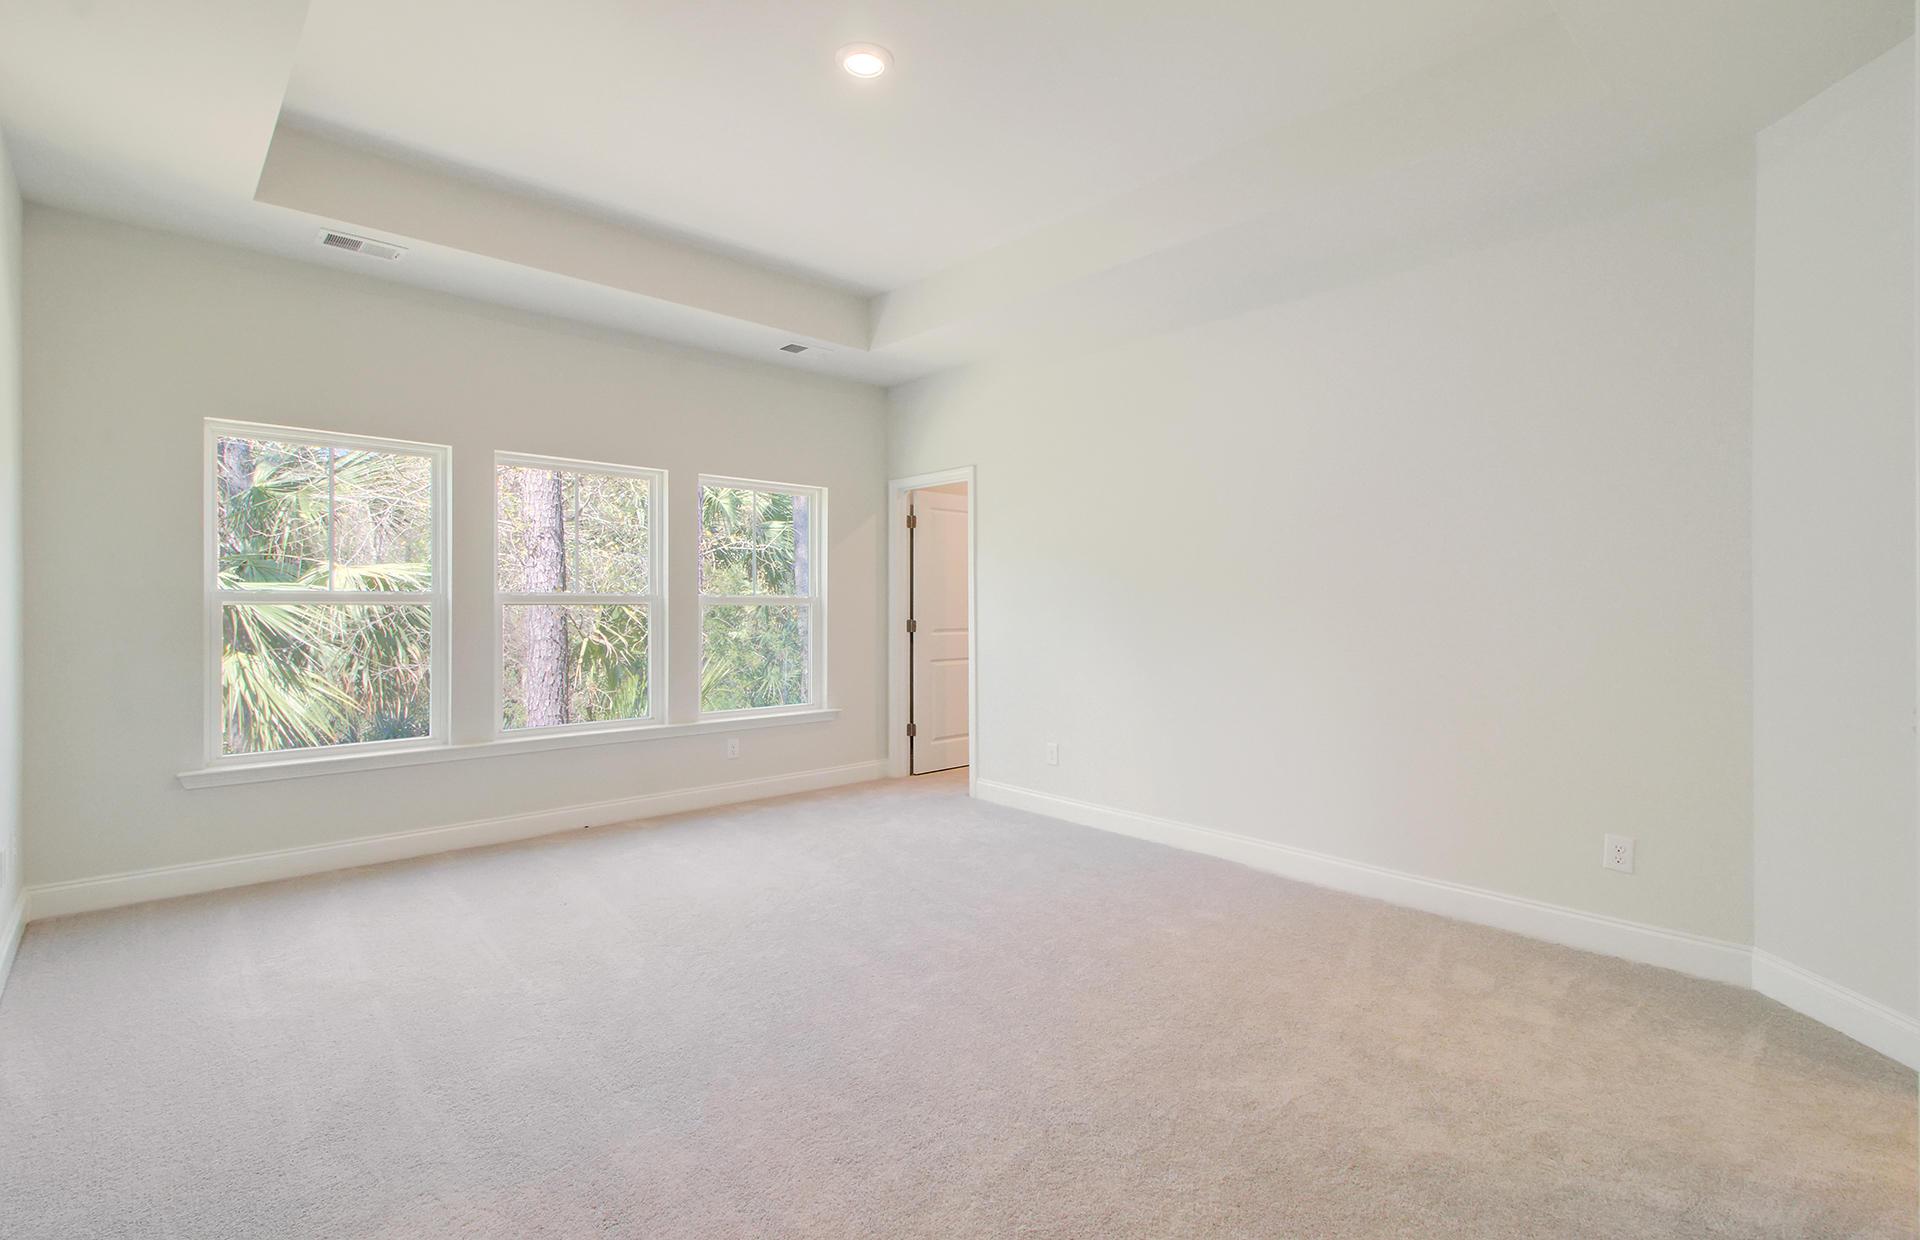 Park West Homes For Sale - 3062 Rice Field, Mount Pleasant, SC - 15